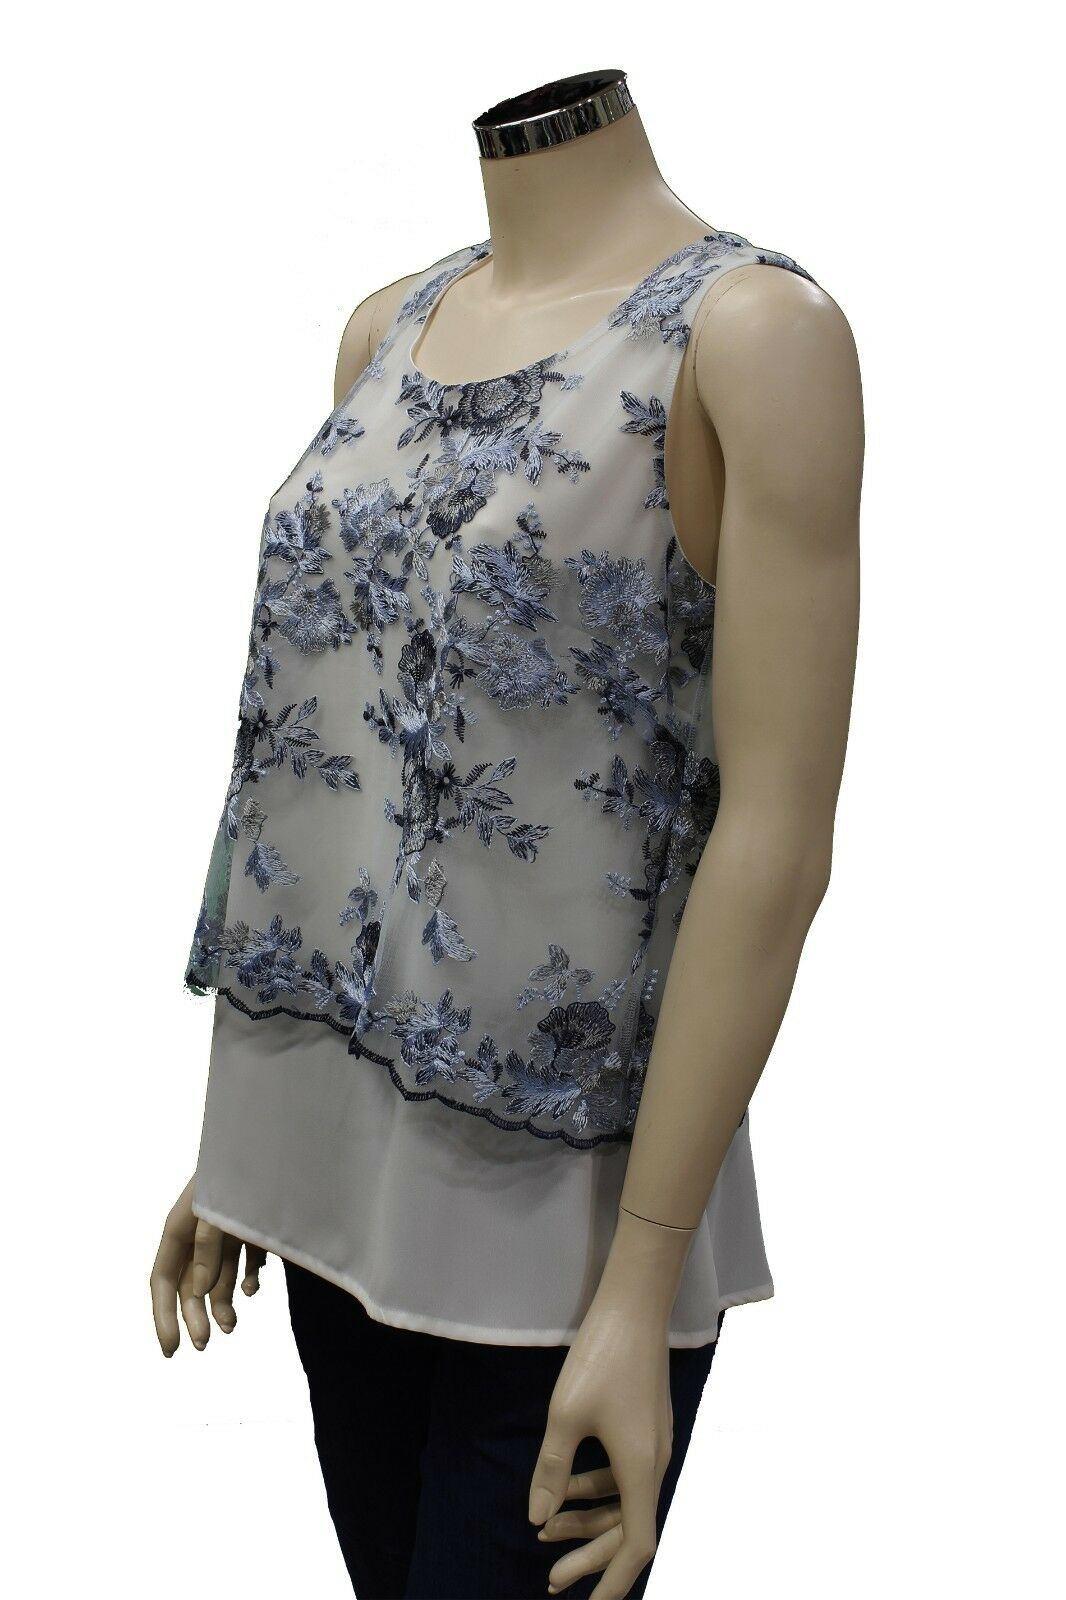 T-Shirt da donna in pizzo bianca Forza9 Forza9 Forza9 Fedora smanicata girocollo casual moda ab7092